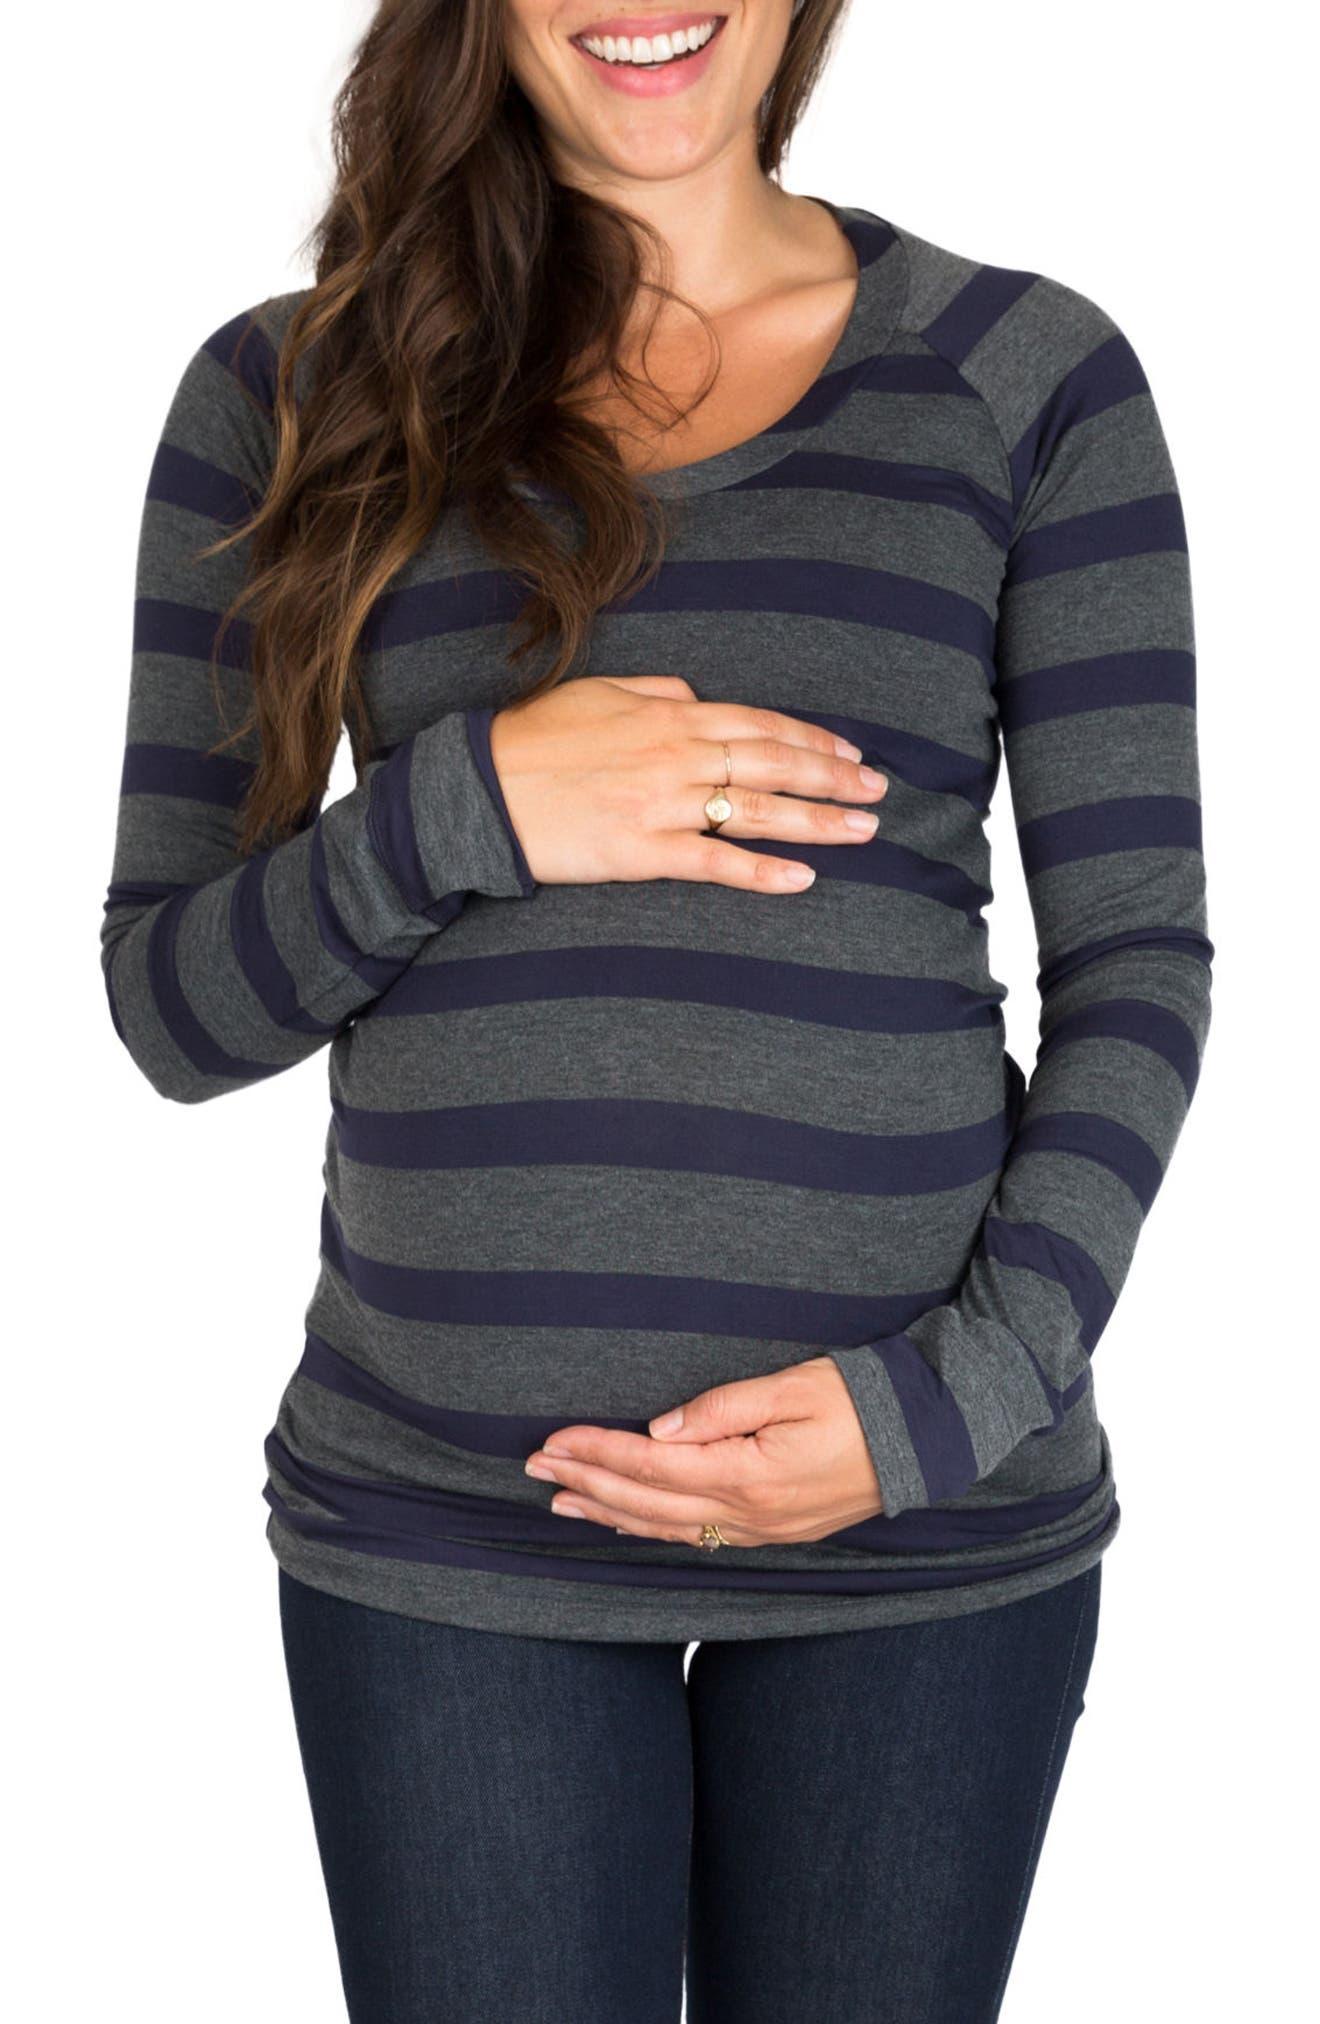 Nom Maternity Phoebe Maternity Top